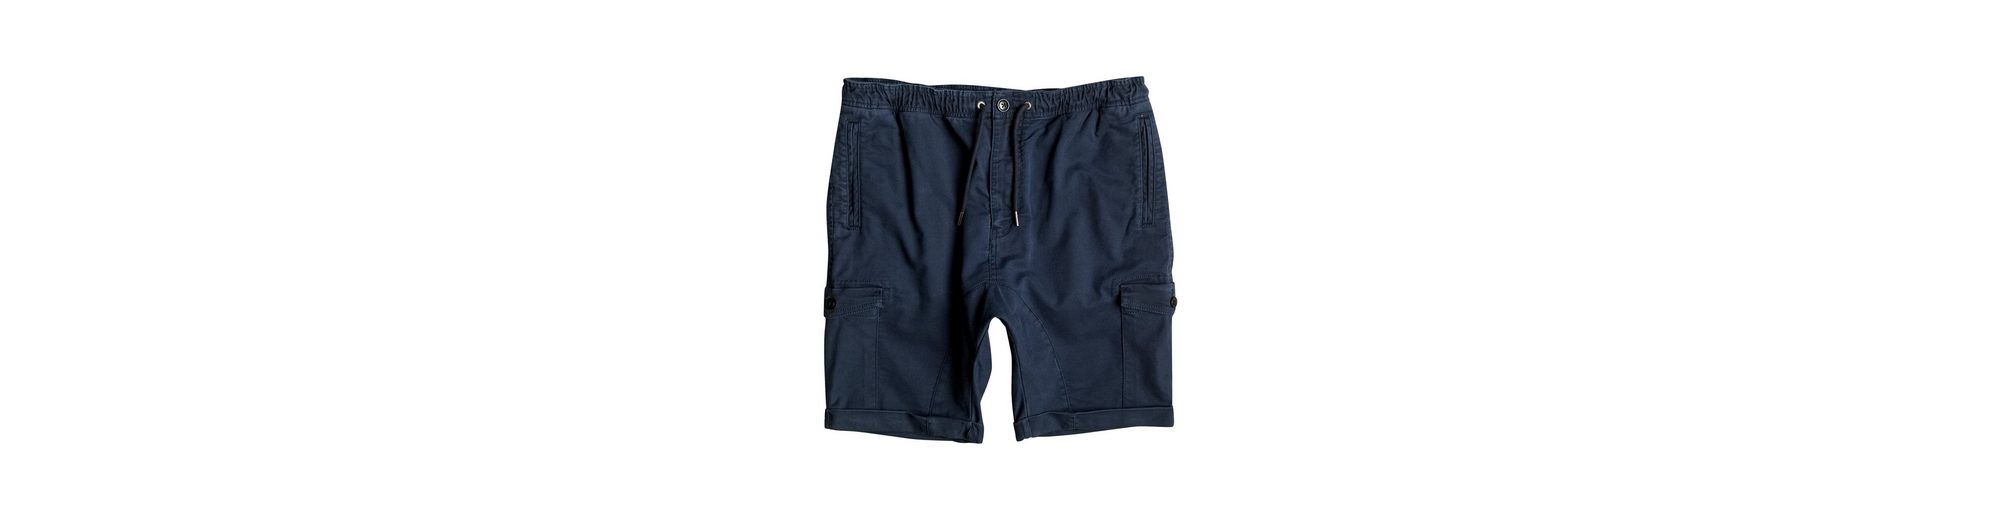 Sweet Quiksilver Cargo shorts Melt Cargo wUaxUqrY